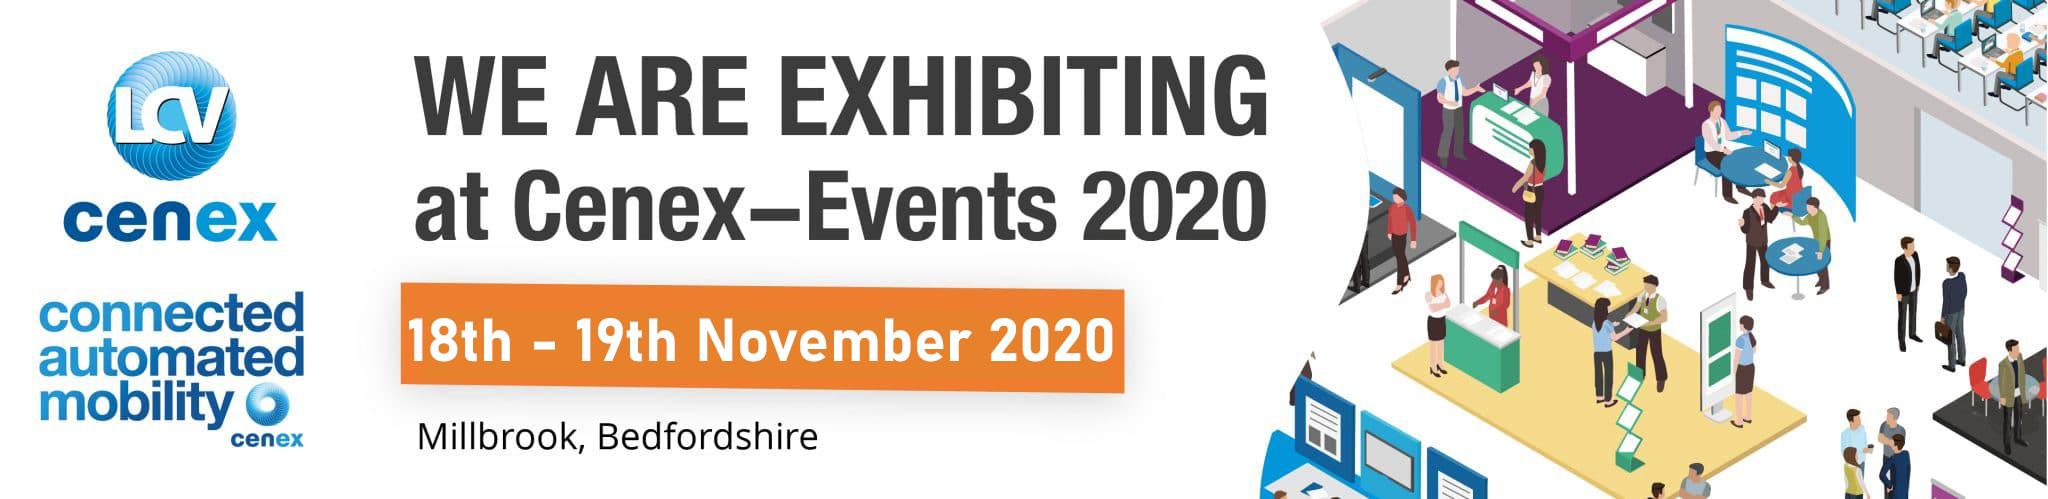 Cenex 2020, 18 - 19 November, Millbrook, Bedfordshire